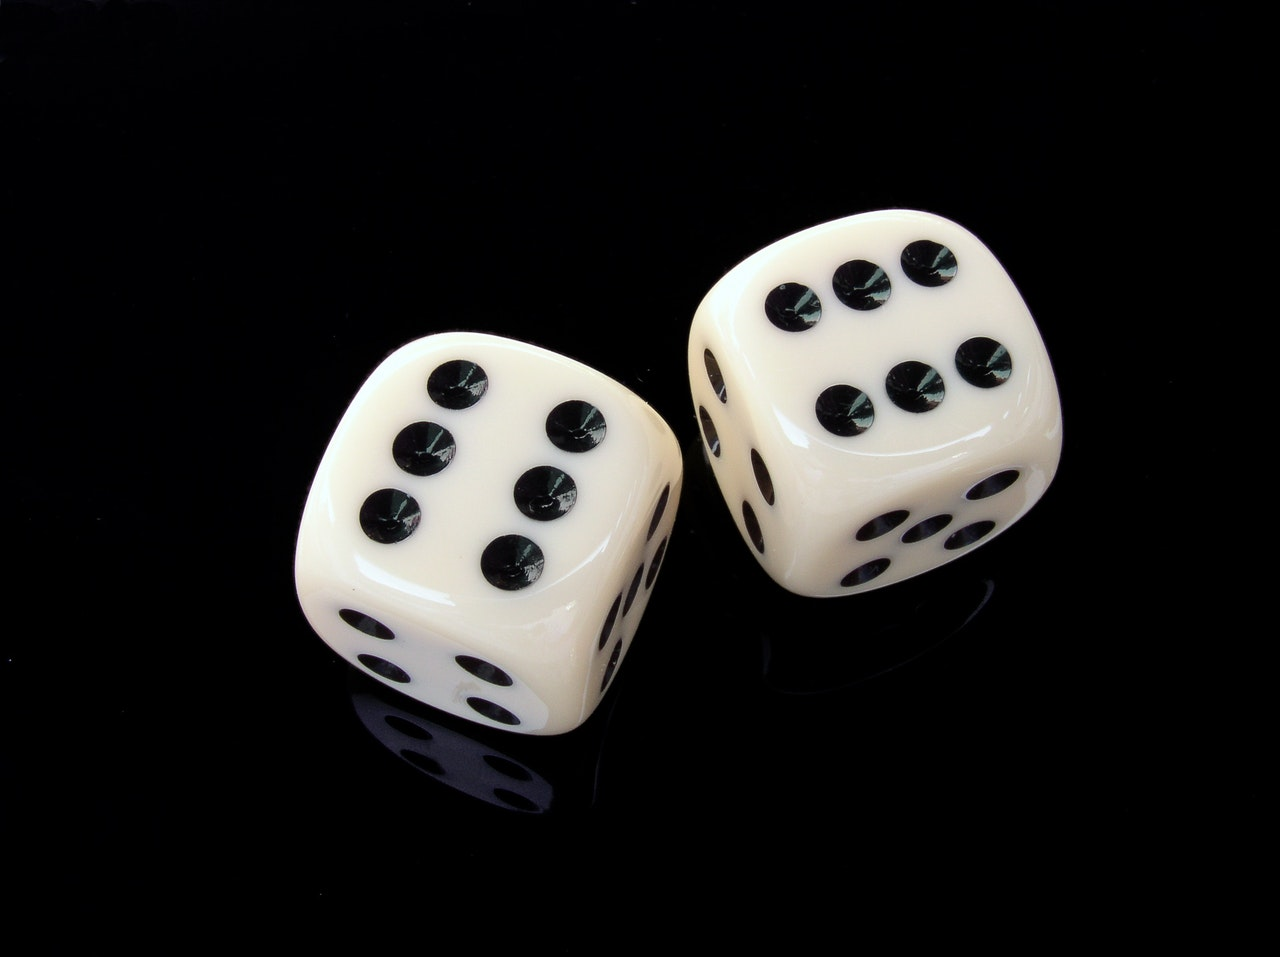 2017_1022215047_cube-six-gambling-play-37524.jpeg